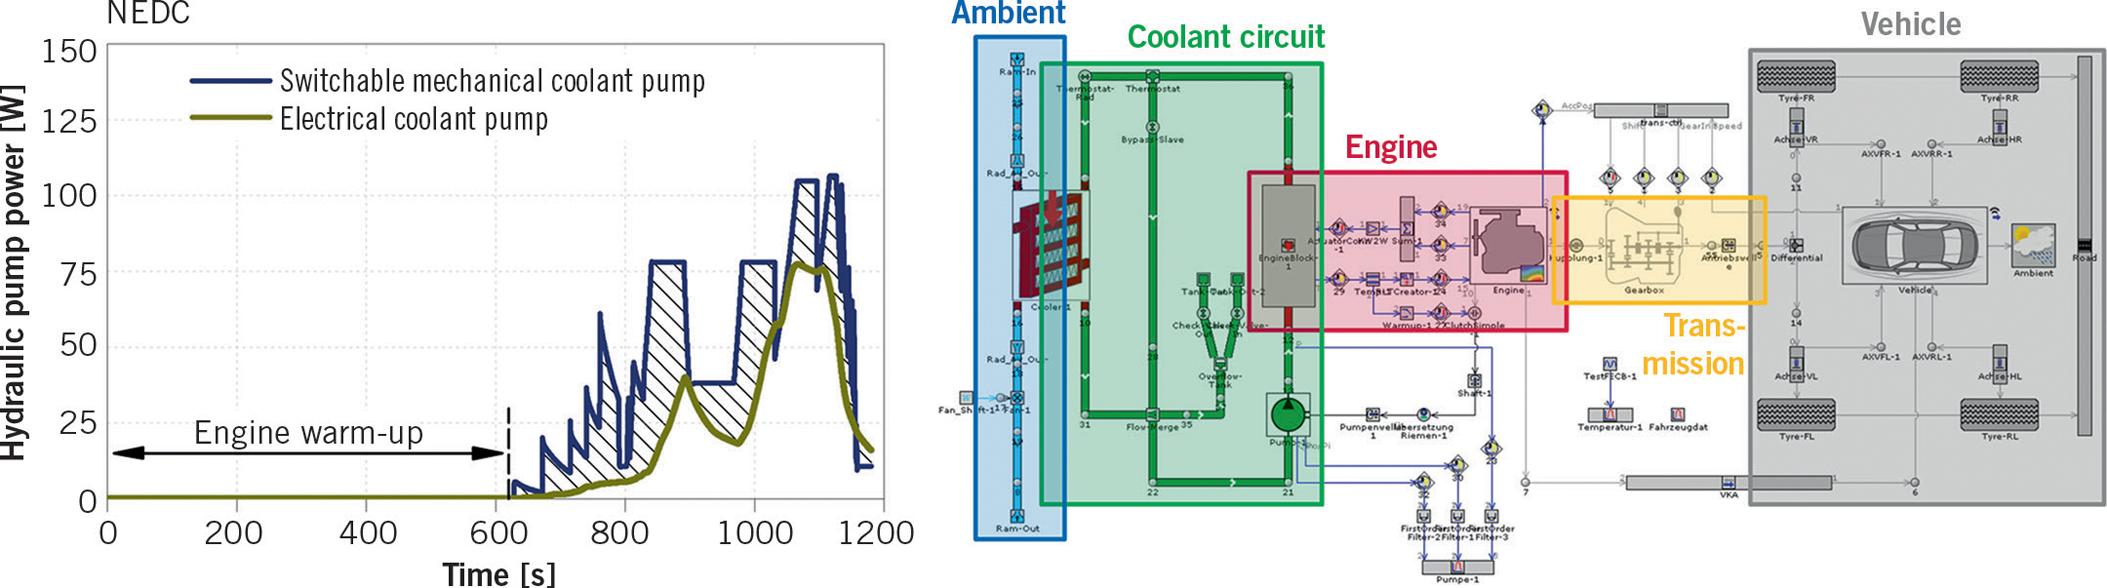 Schematic Wiring Diagram Ach 800 Detailed Schematics Drvasmb2051 Electrical 48 V Main Coolant Pump To Reduce Co2 Emissions Springerlink Onan